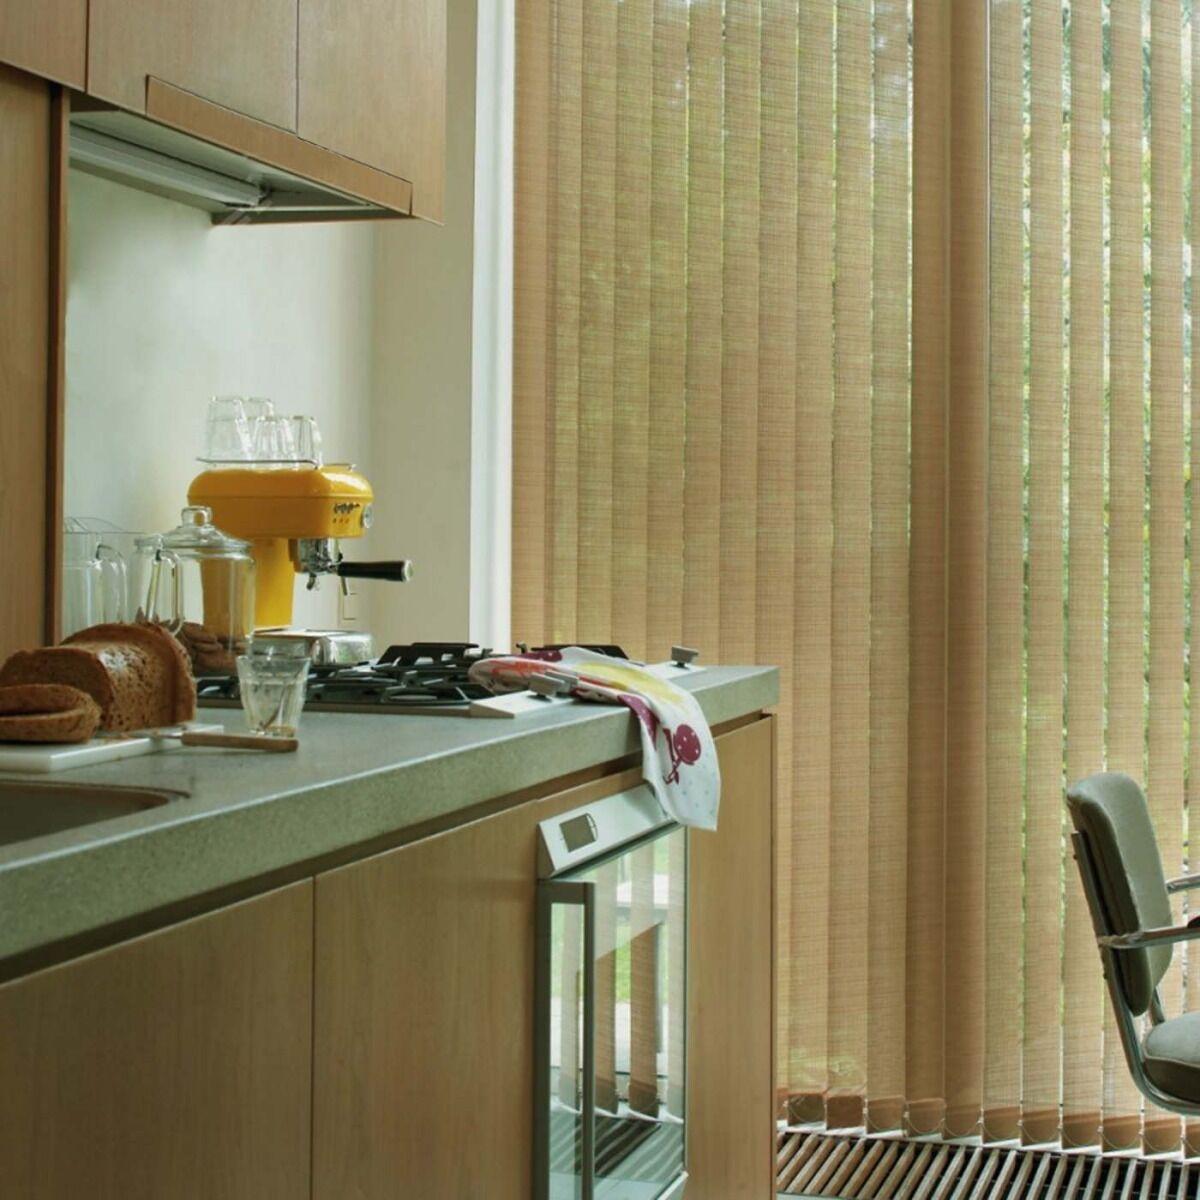 VRT Lamell Med Halv Transparent Tekstil